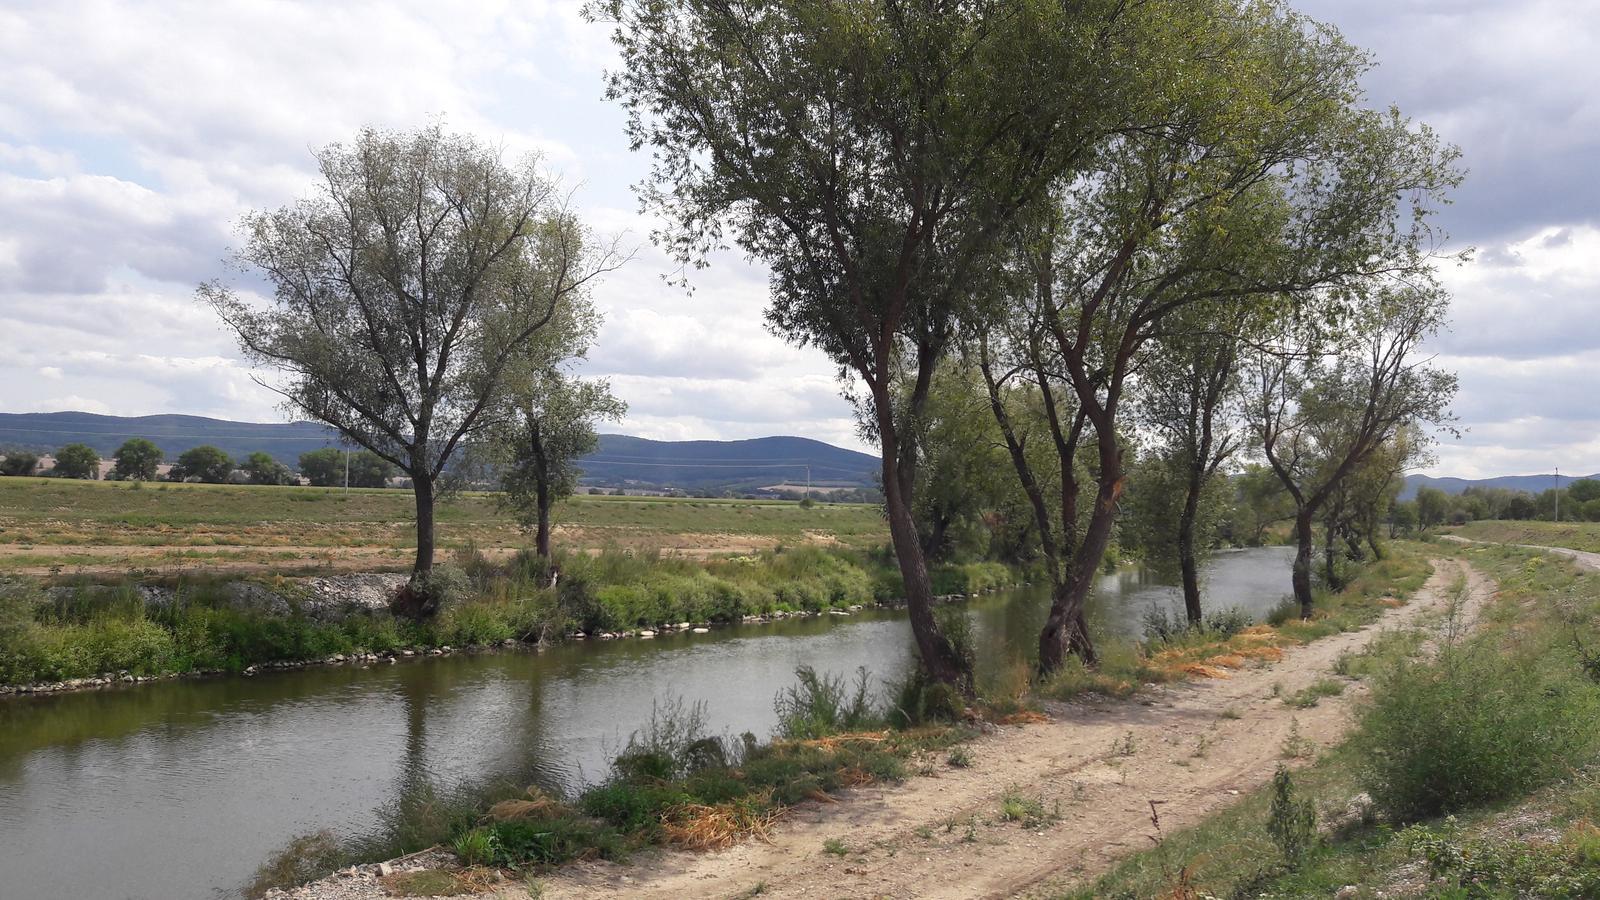 Zaciname stavat nas sen - blizko domu mame rieku a cyklisticku hradzu :)